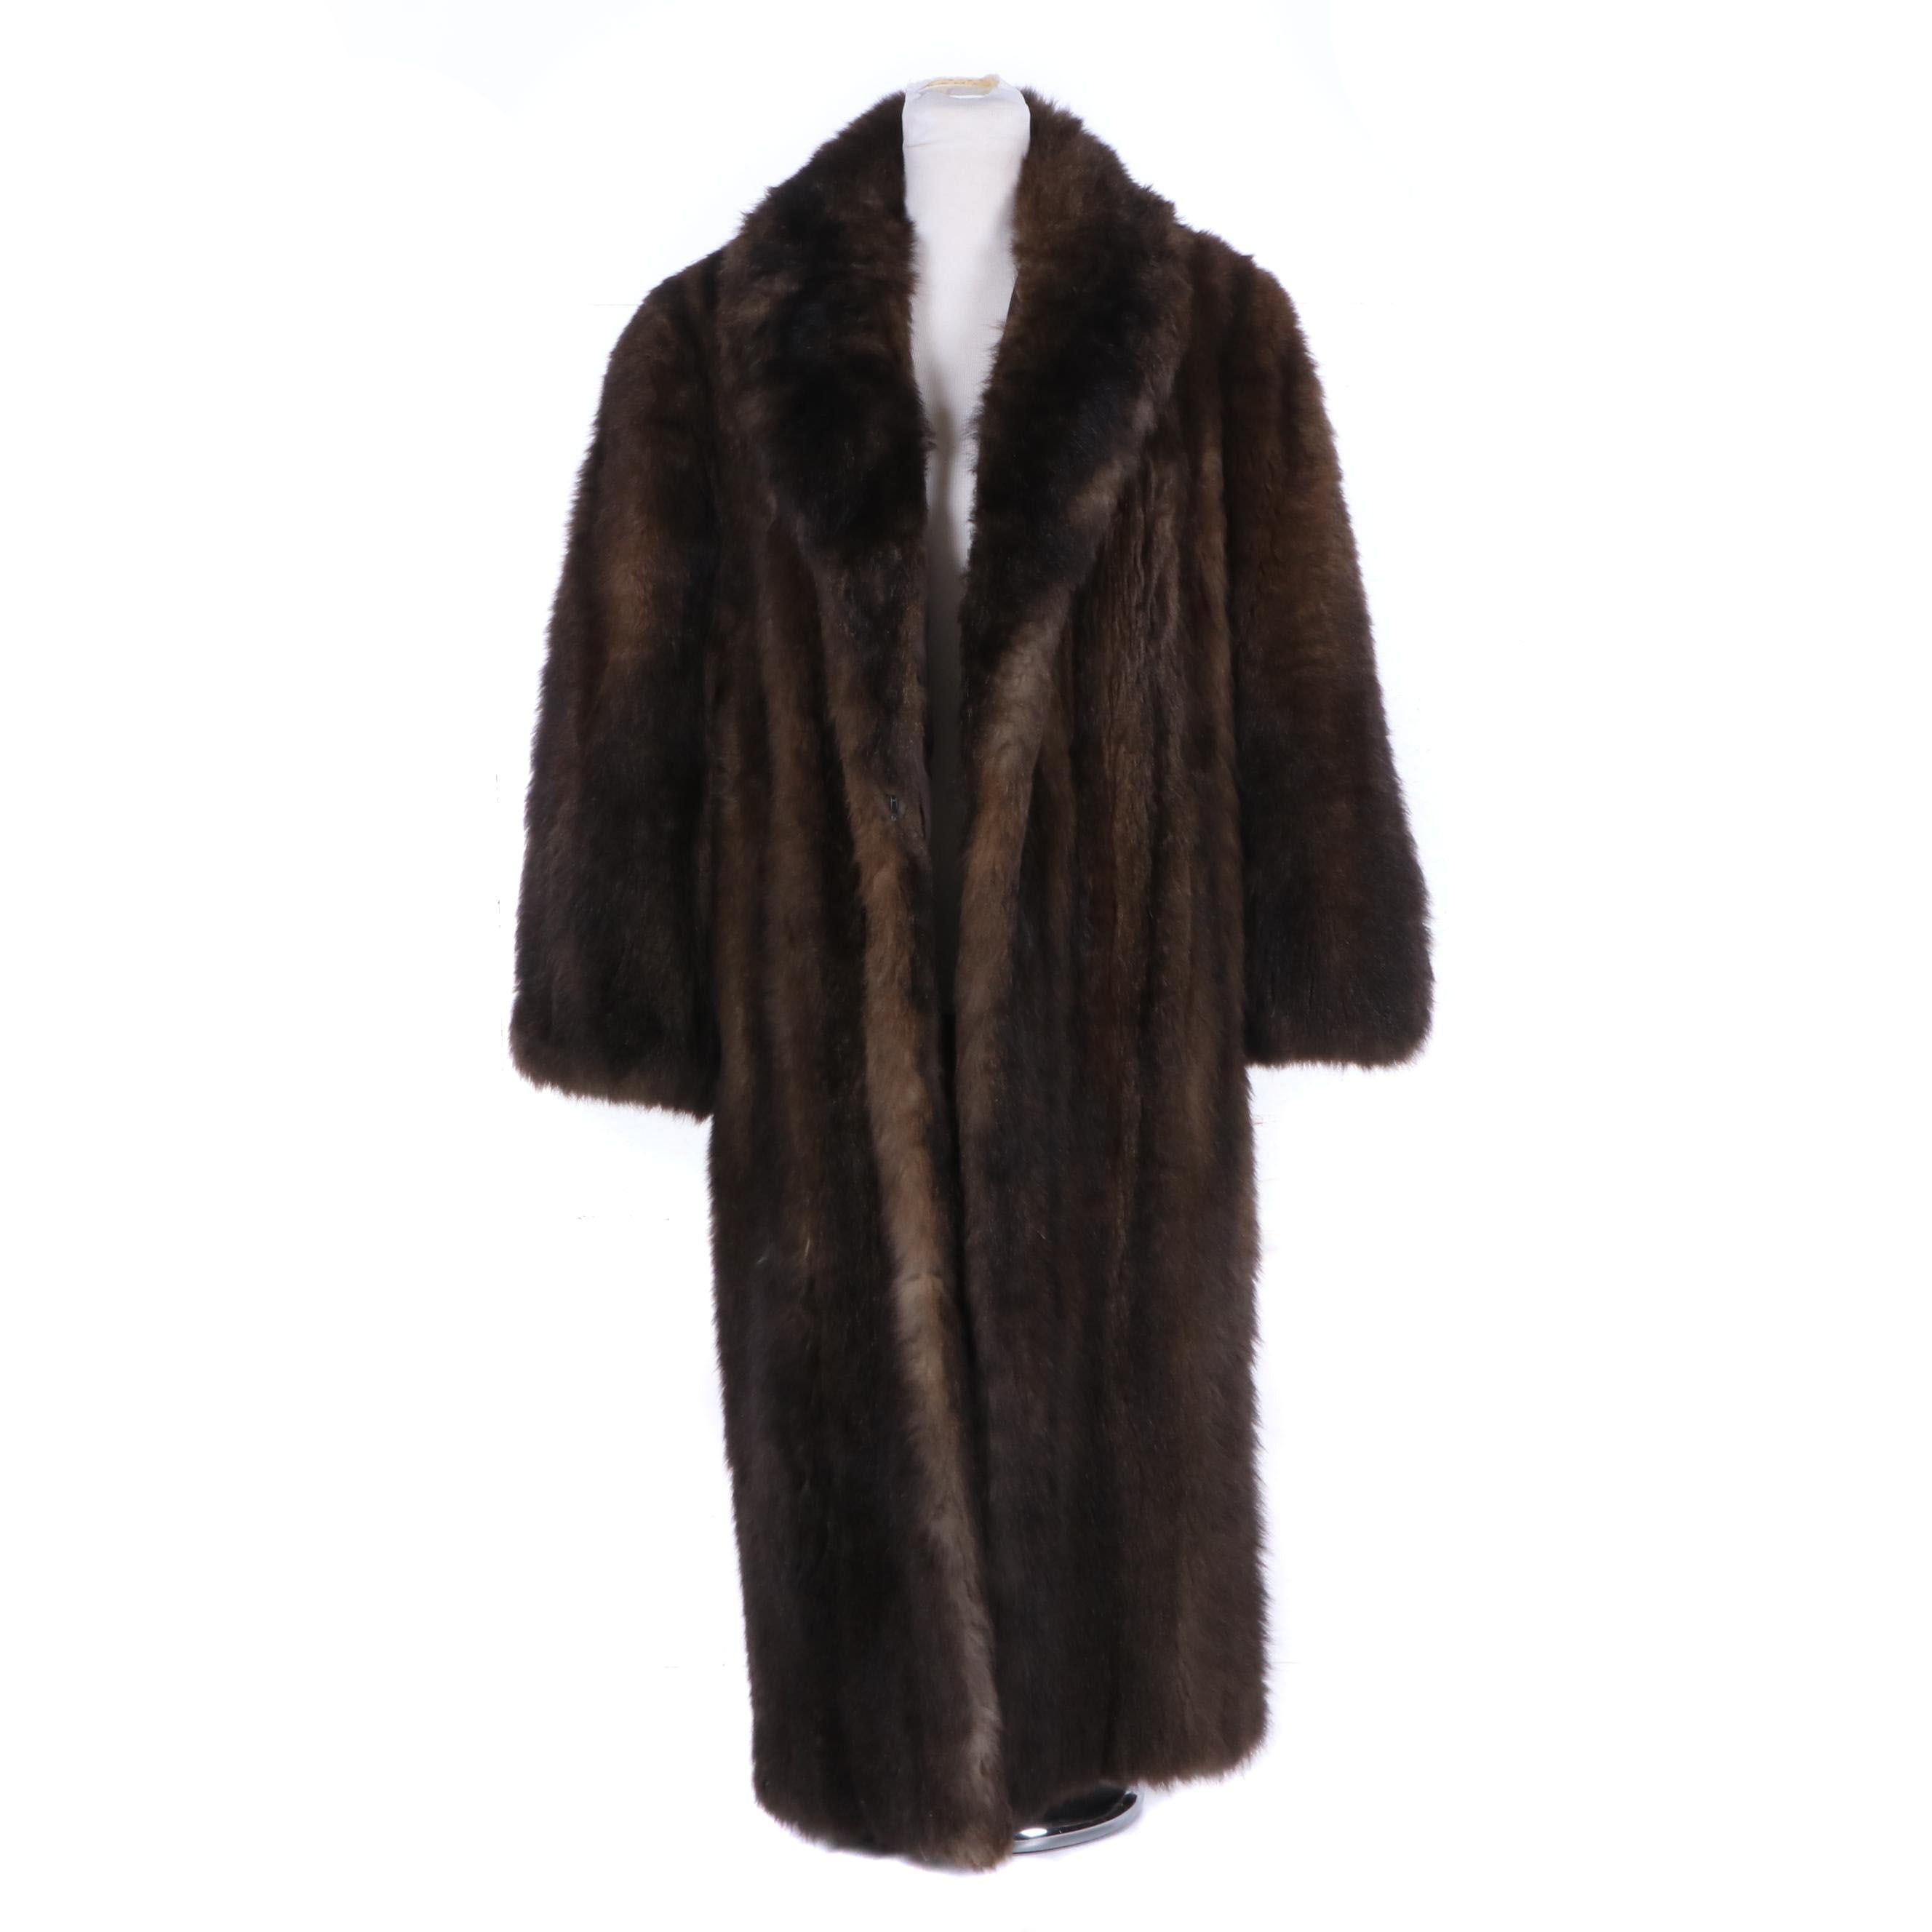 Women's Vintage Full-Length Brown Opossum Fur Coat